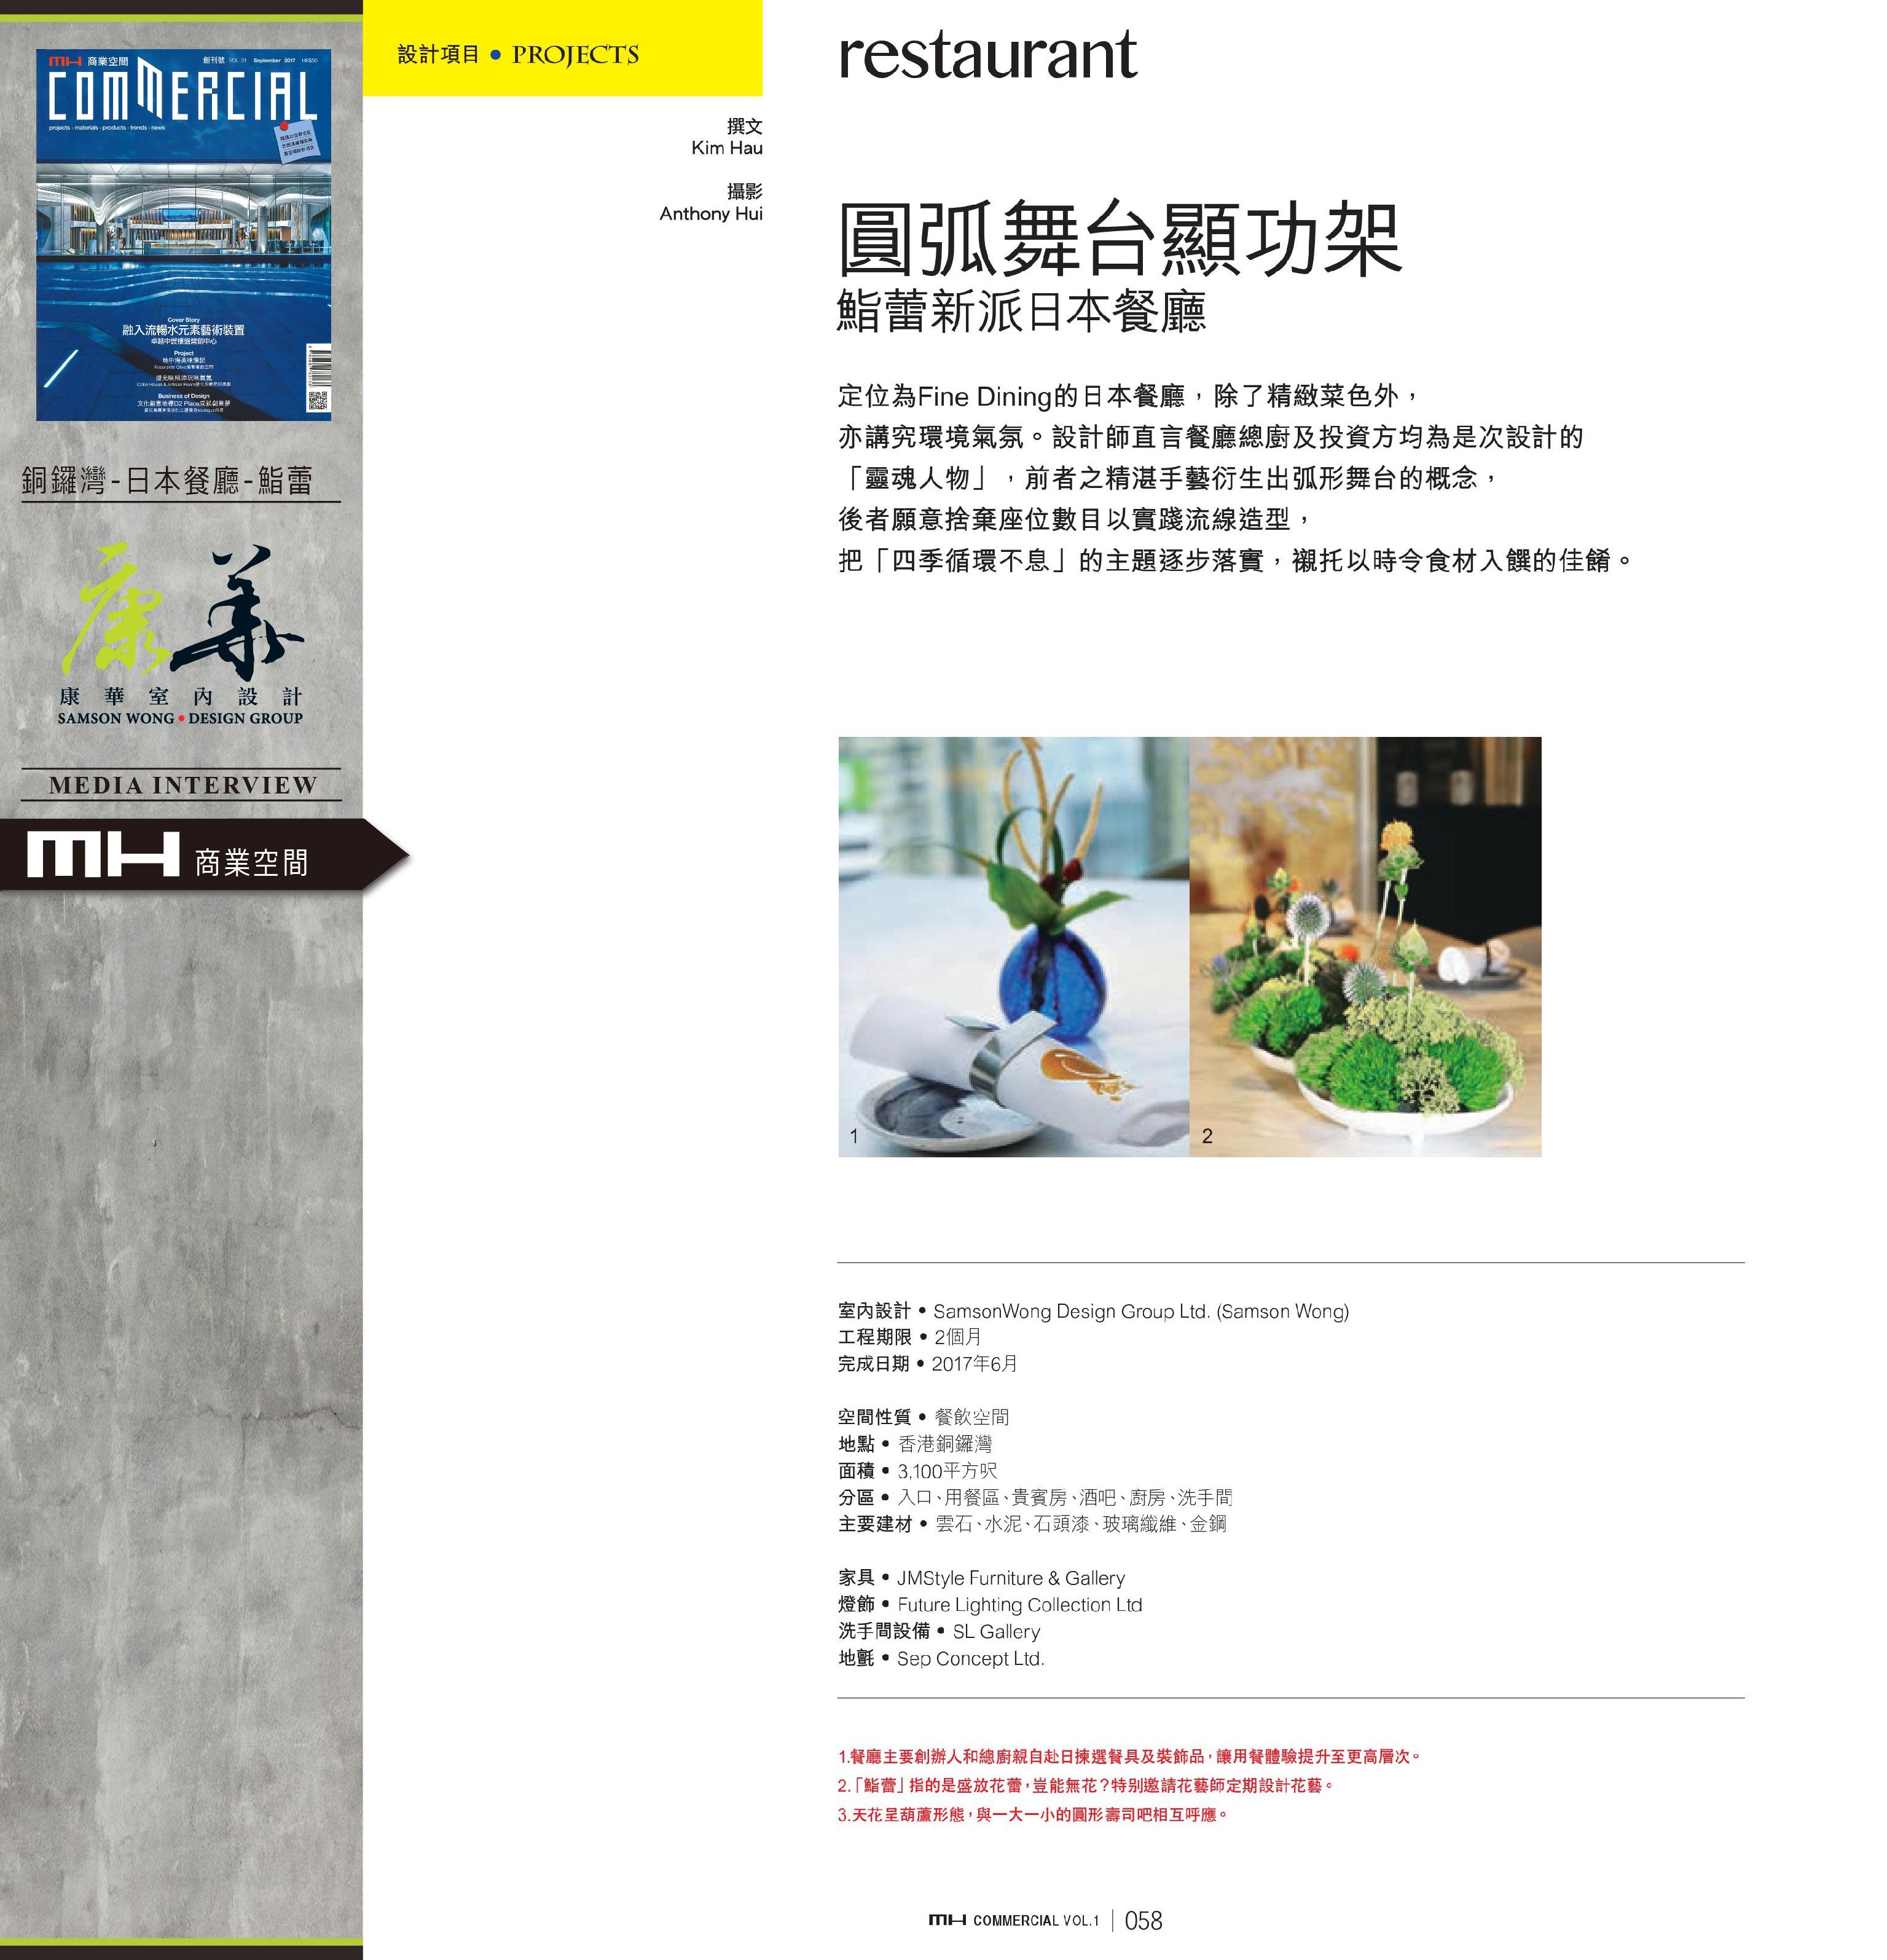 MH Commercial Nov-01